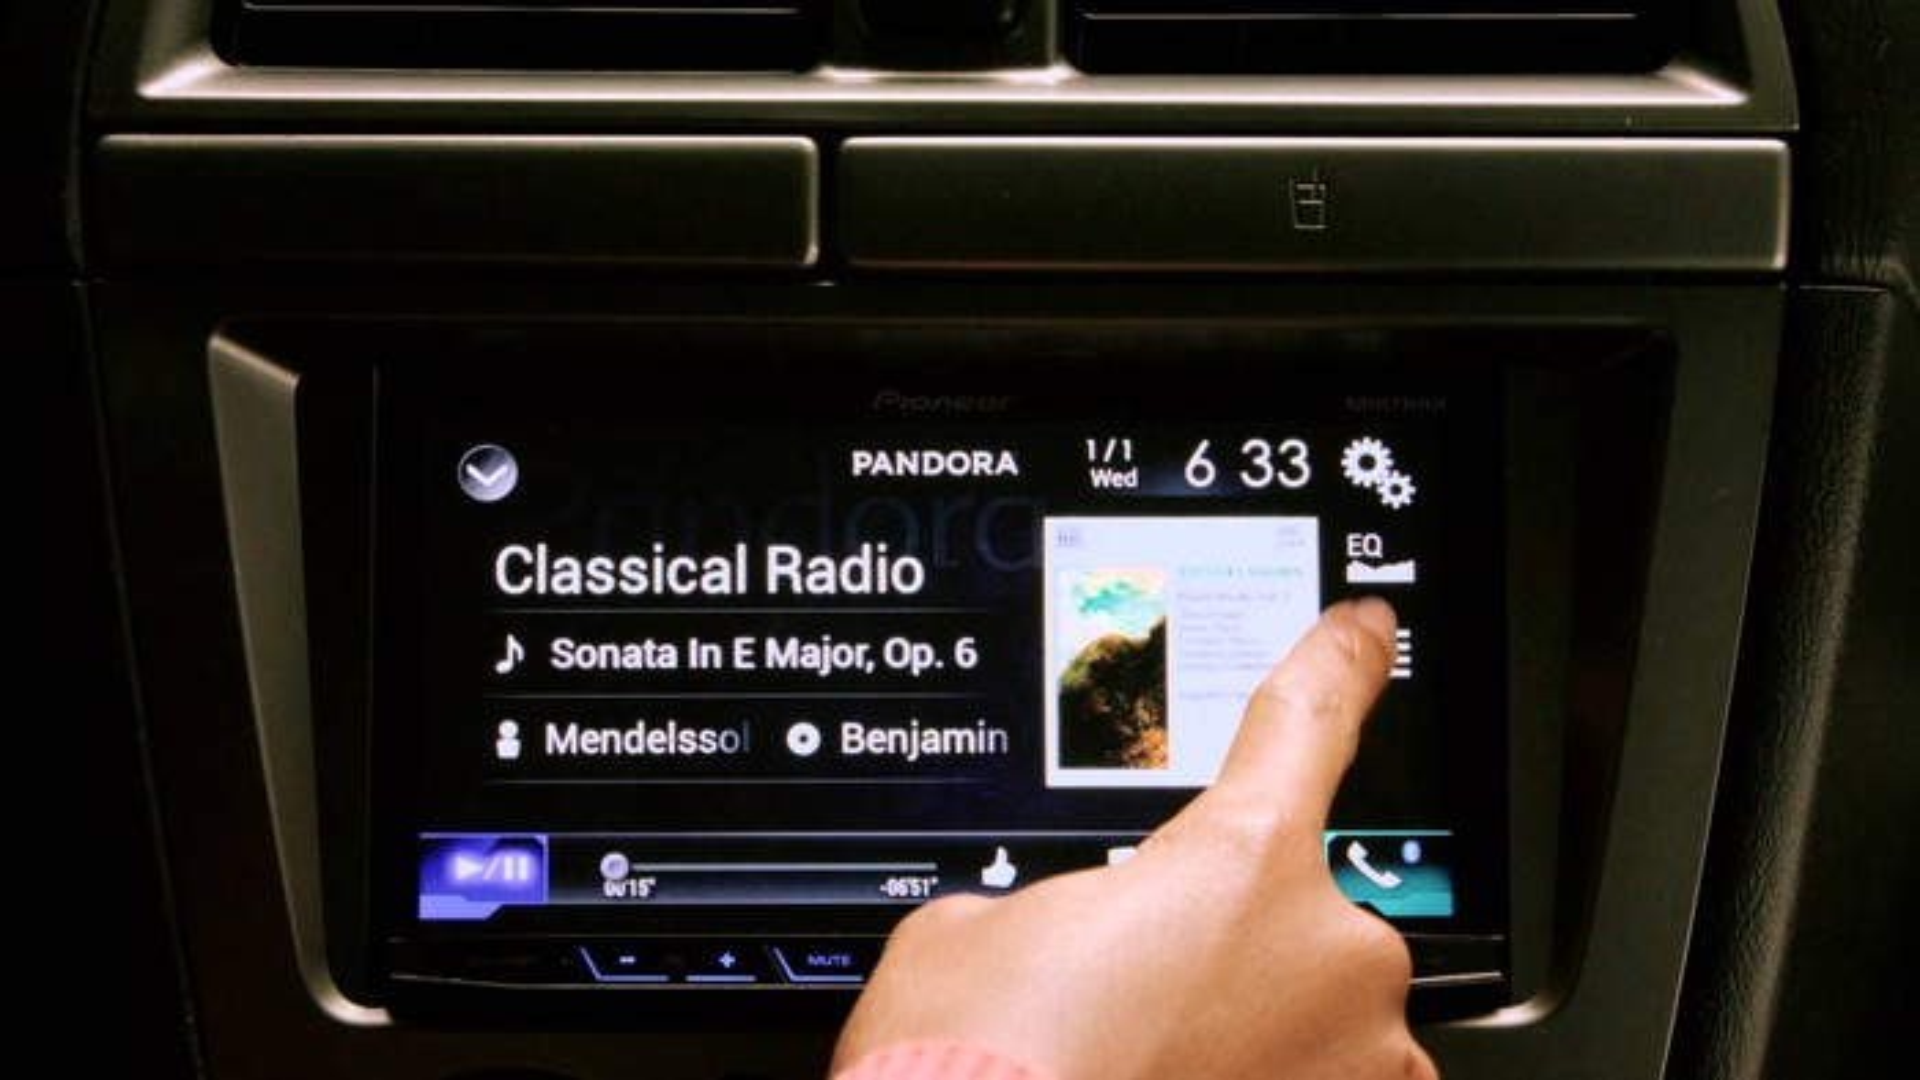 Pandora app running on a car dashboard.